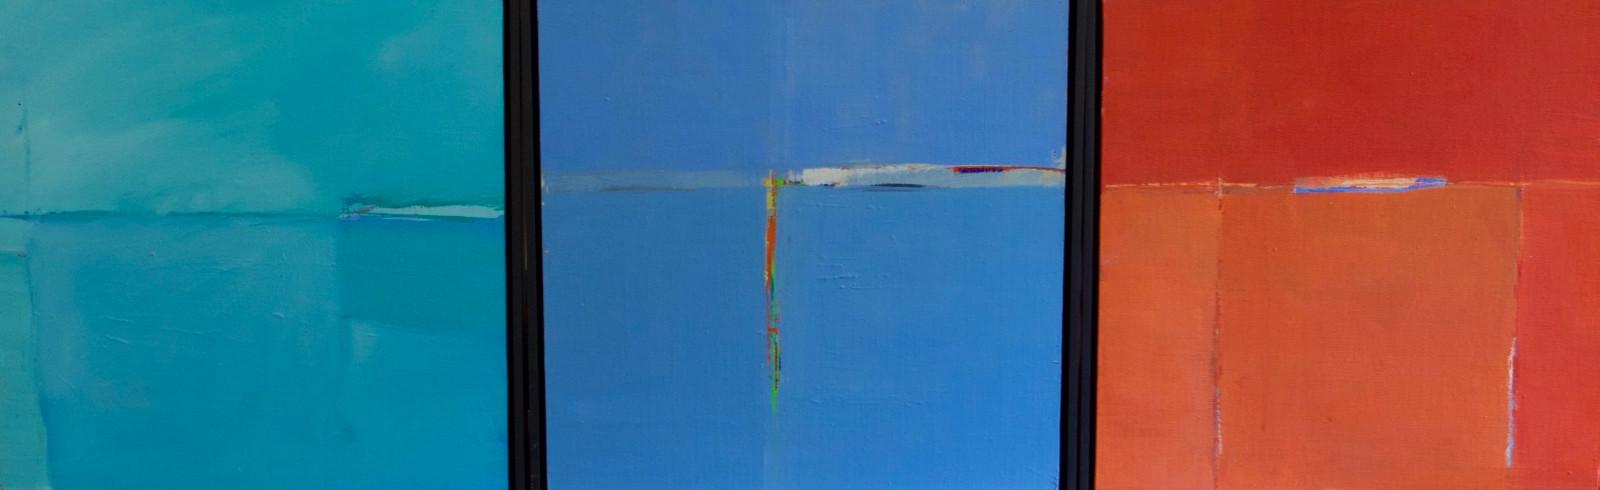 Headland I, II and III triptych | c.2011 | Oil on board | each panel 42 x 42 cm